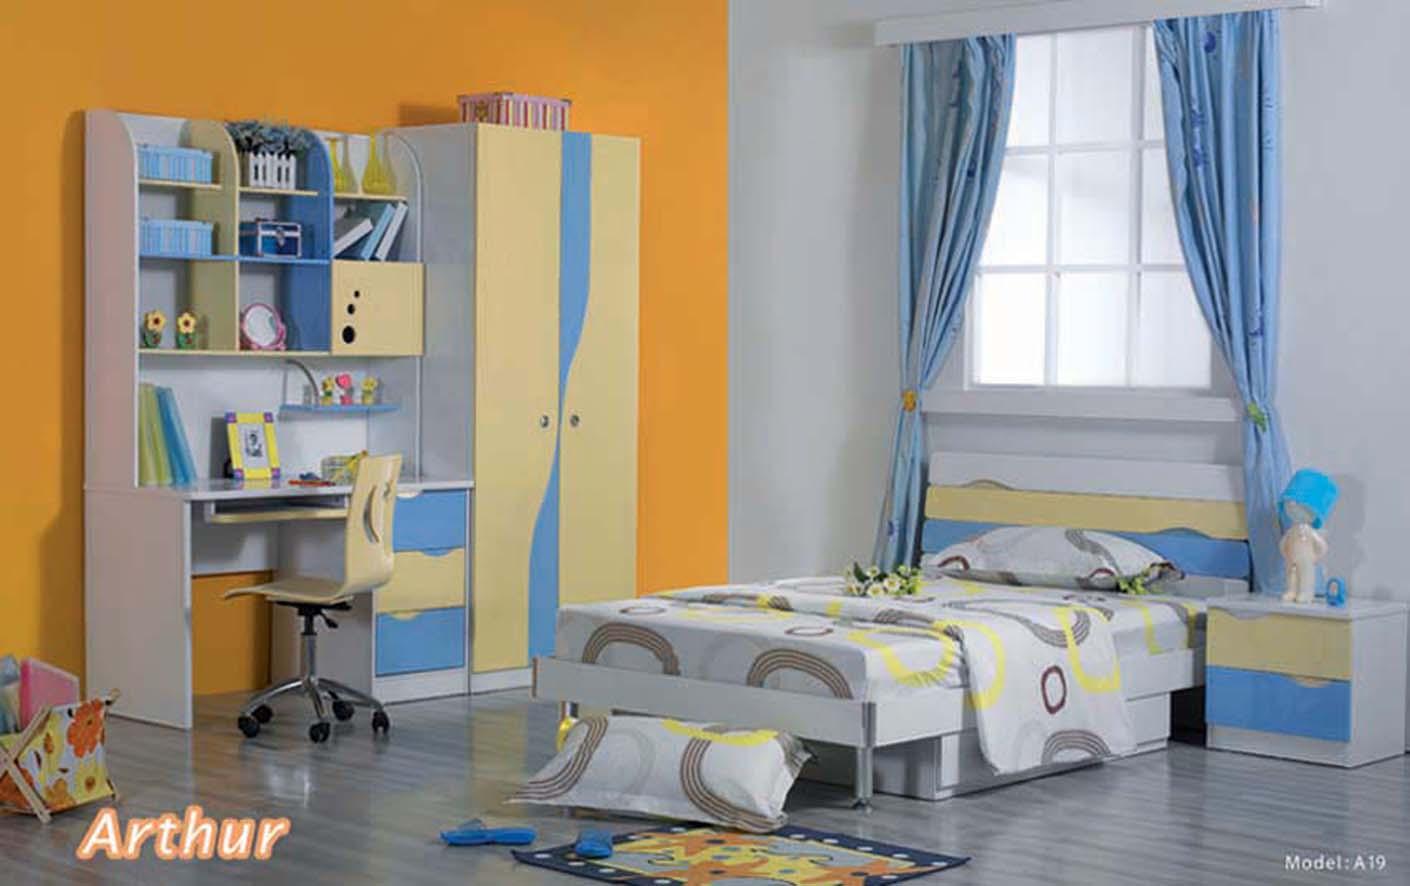 How to design a Kids bedroom